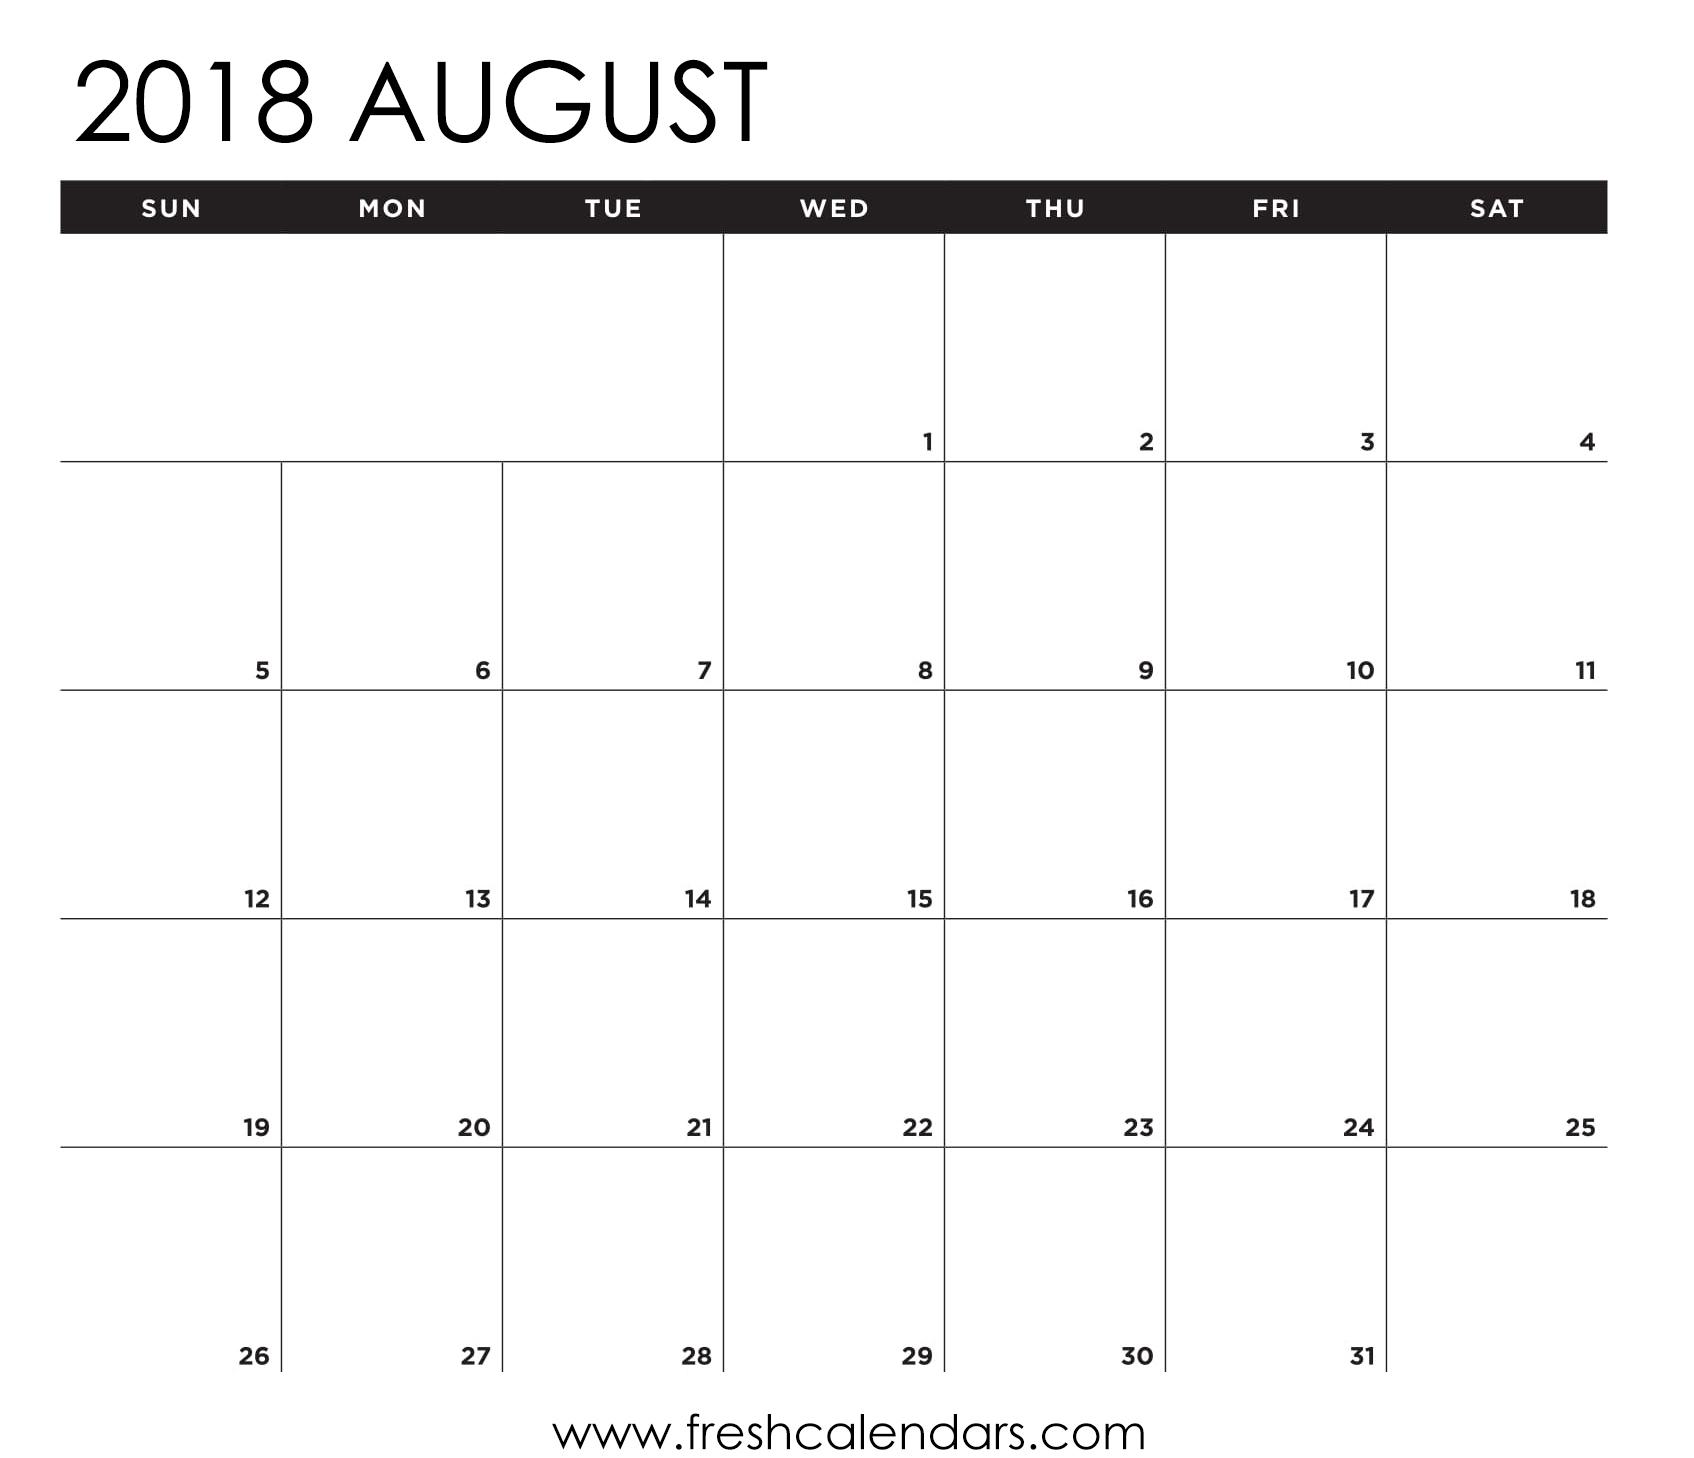 August 2018 Calendar Printable - Fresh Calendars